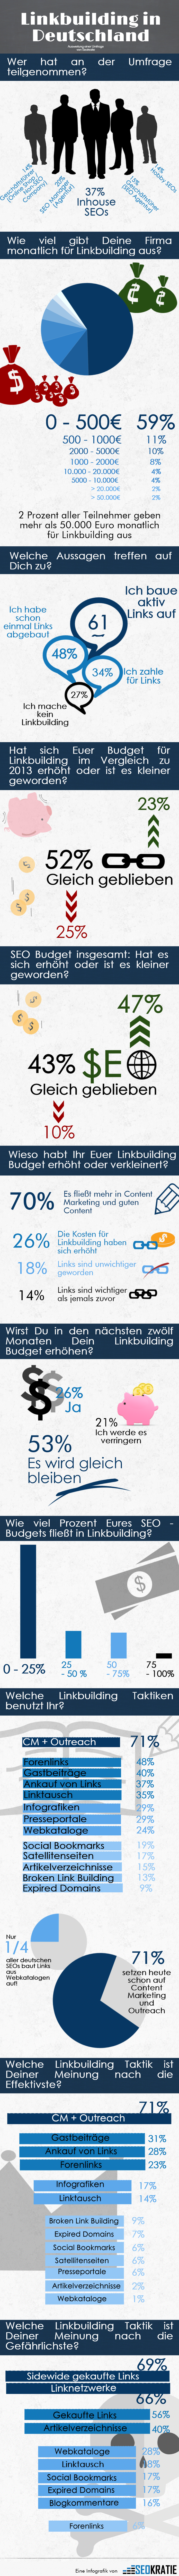 Linkbuilding Umfrage 2014: seo studie deutschland